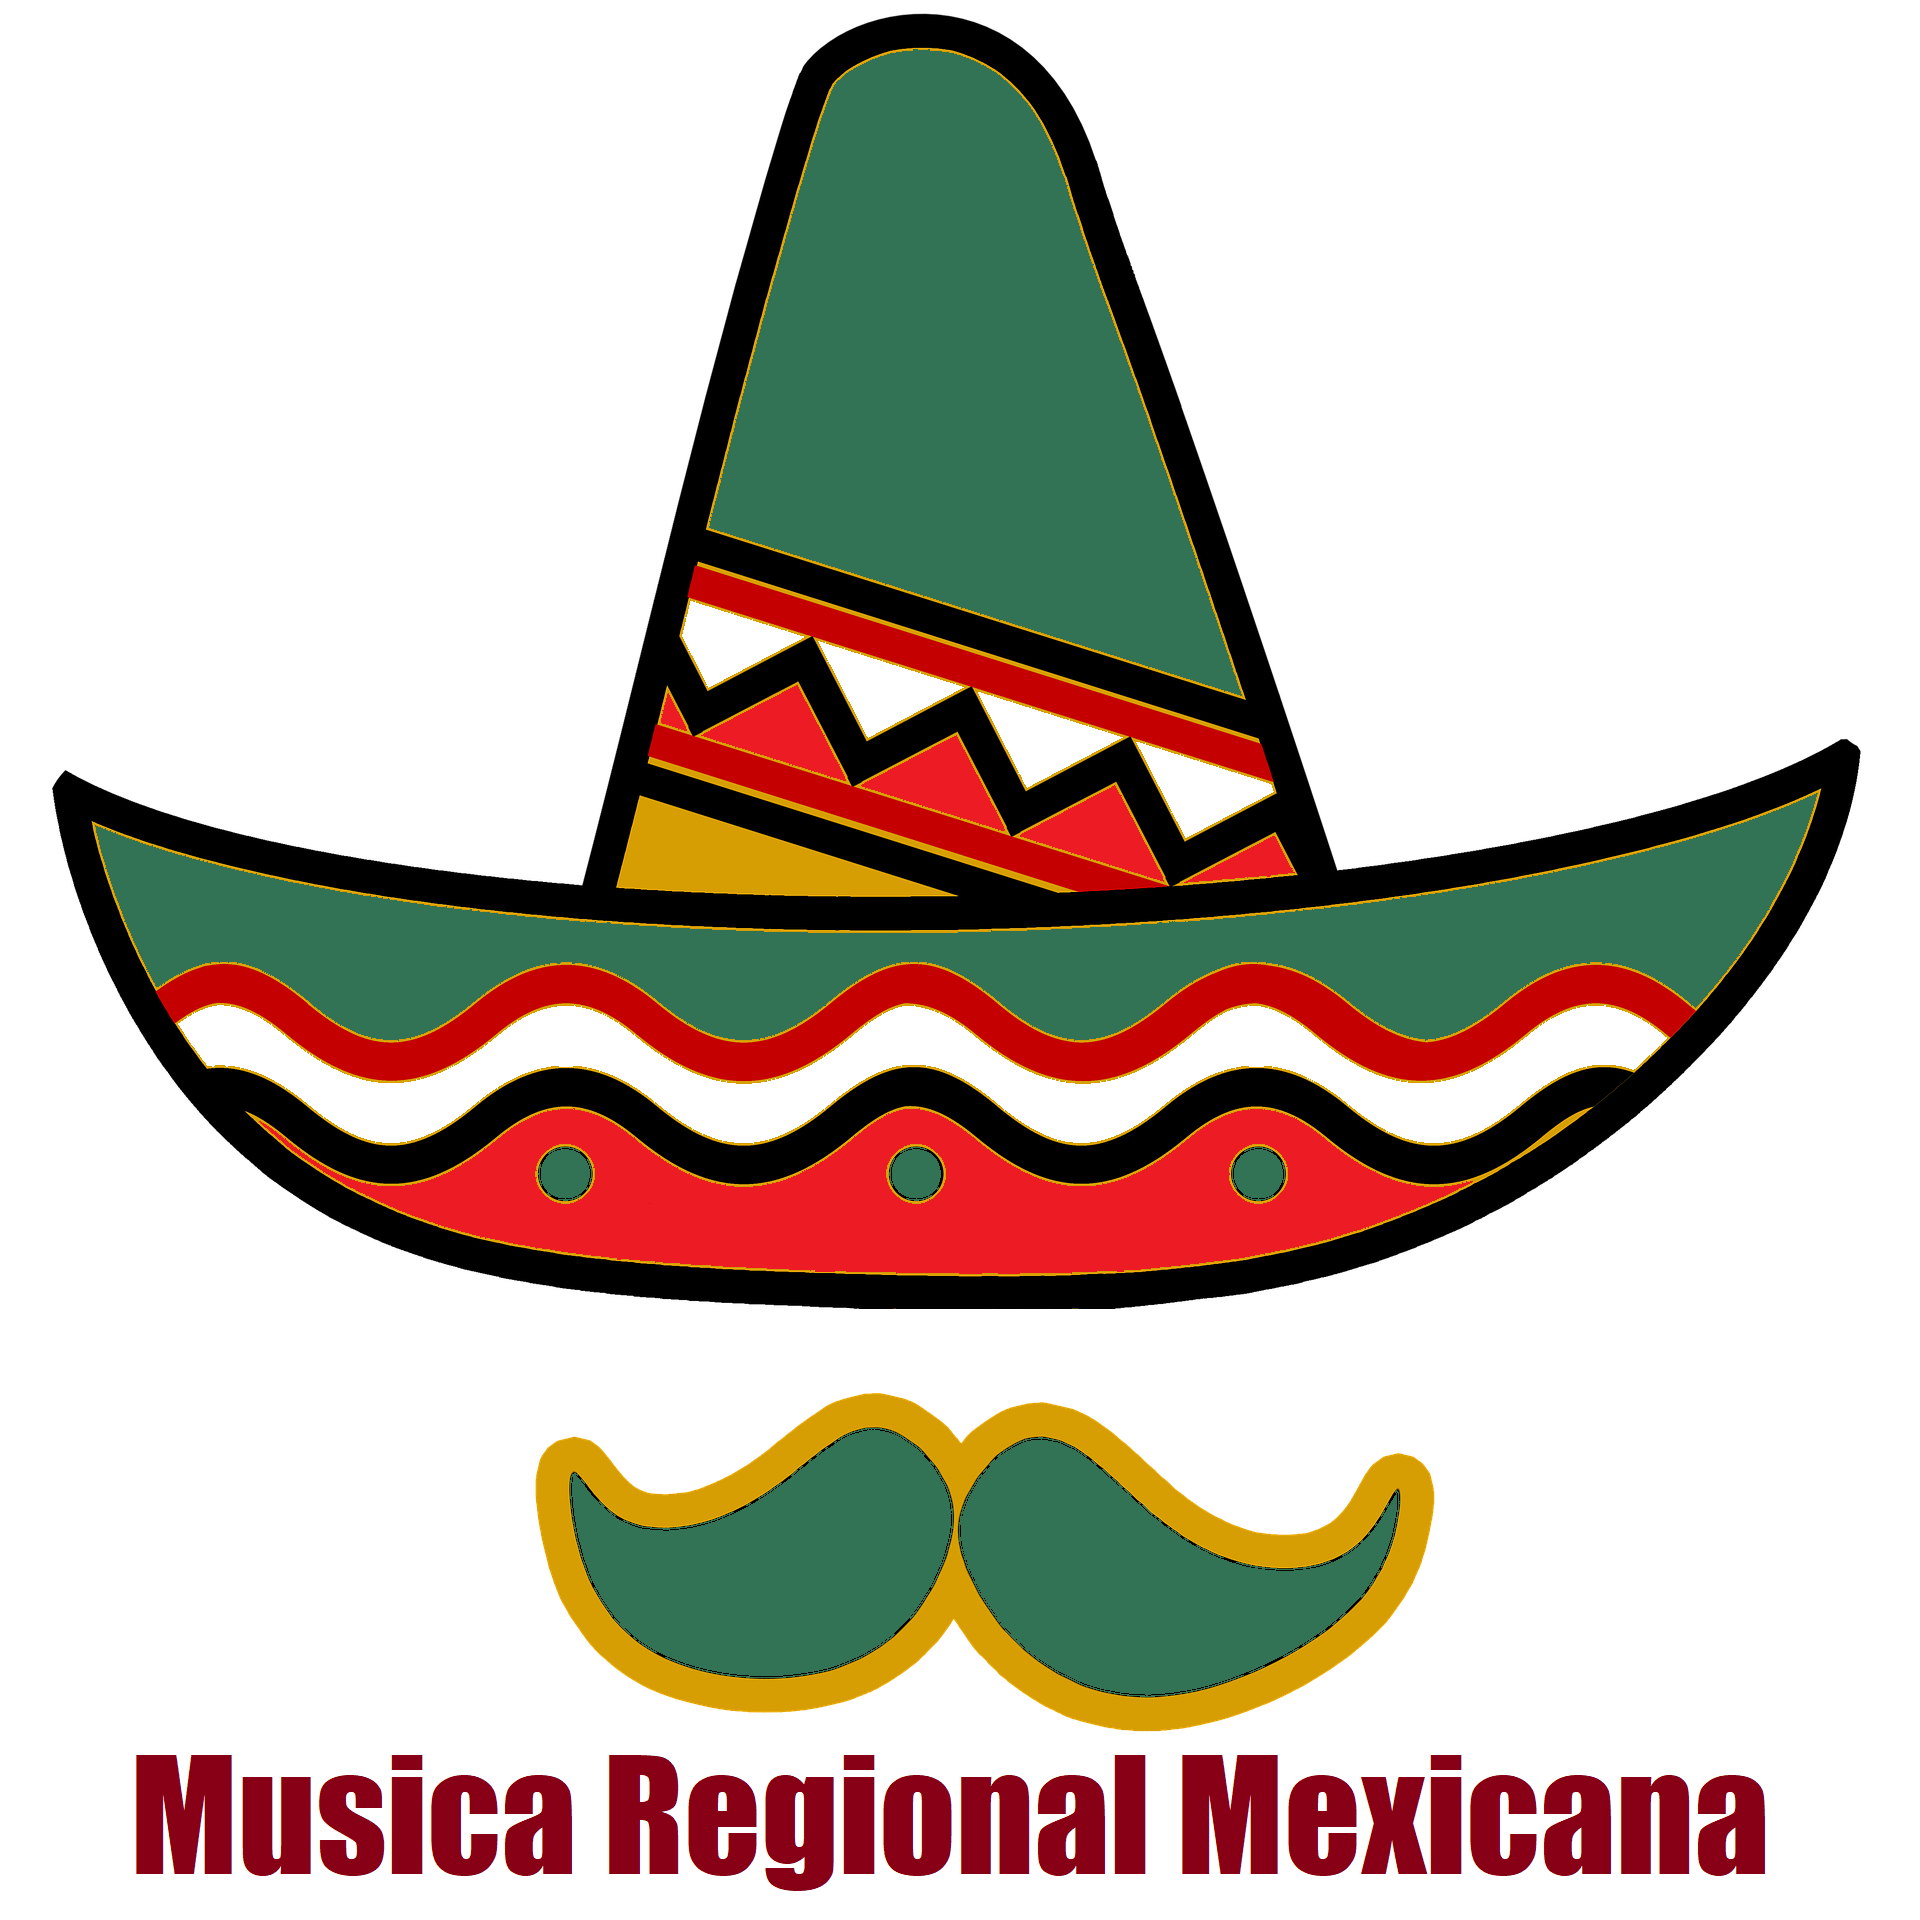 Permian Basin Musica Regional Mexicana